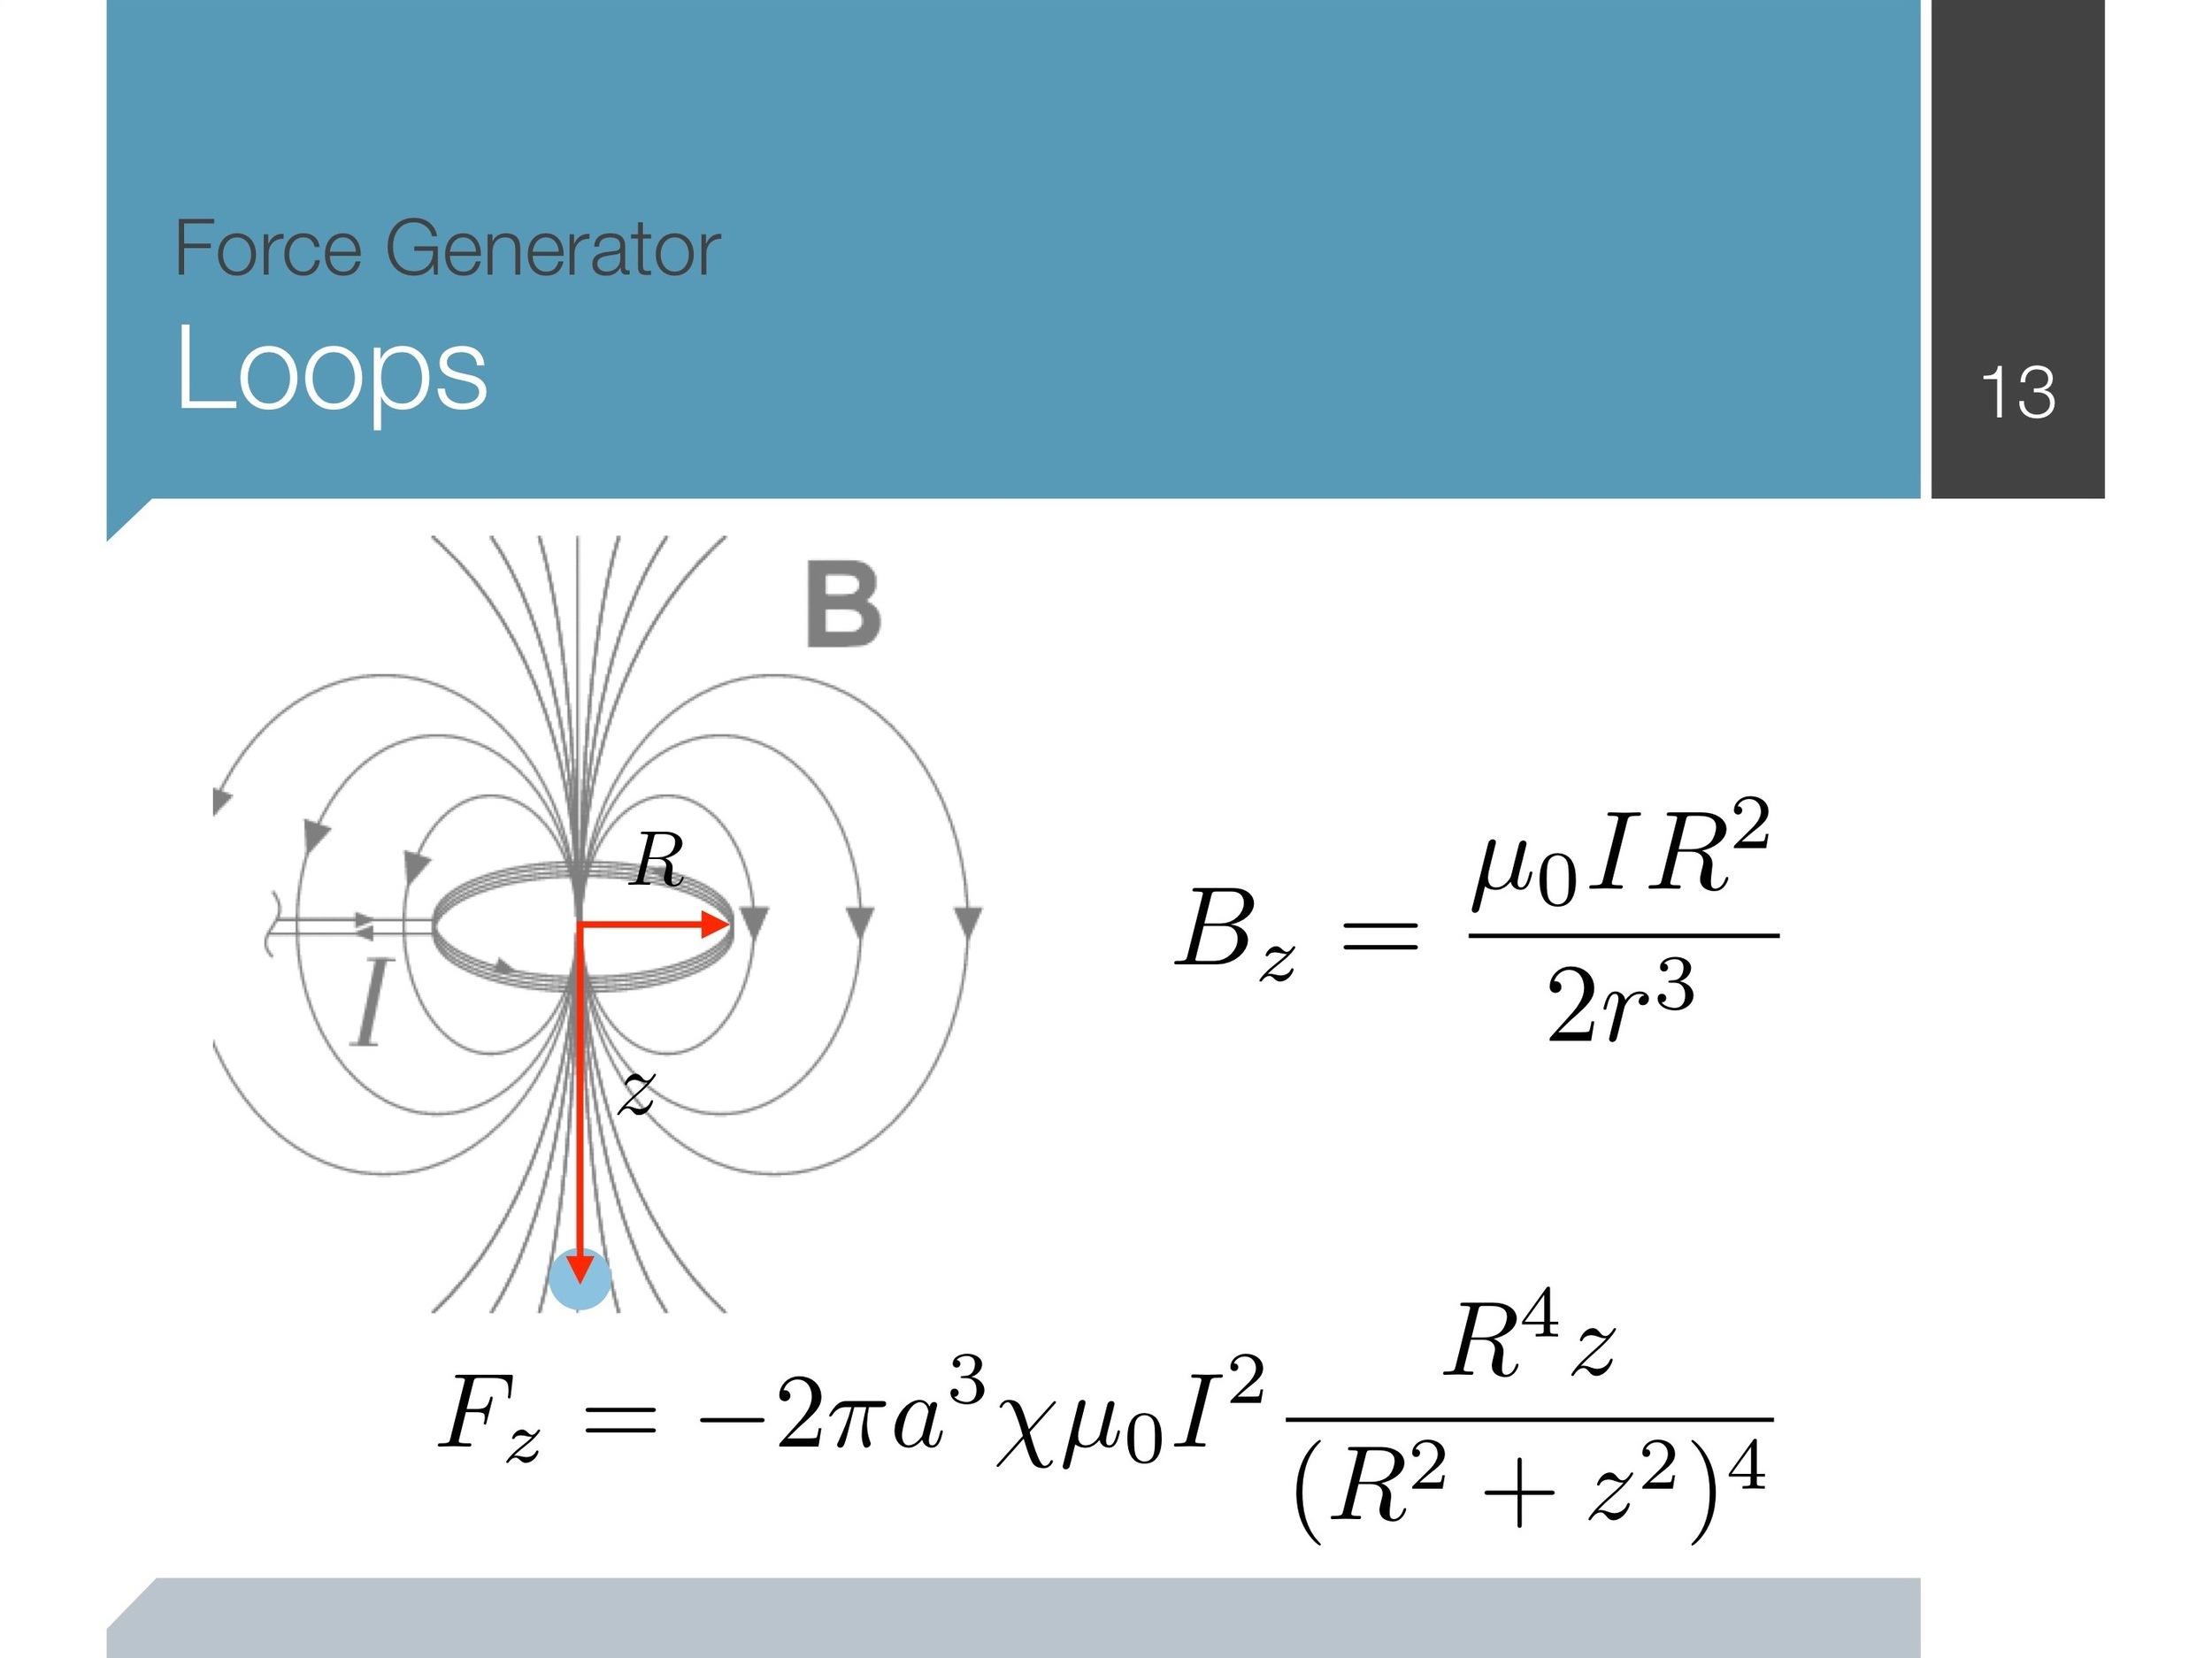 magnetic-tweezers_presentation 19 copy.jpeg